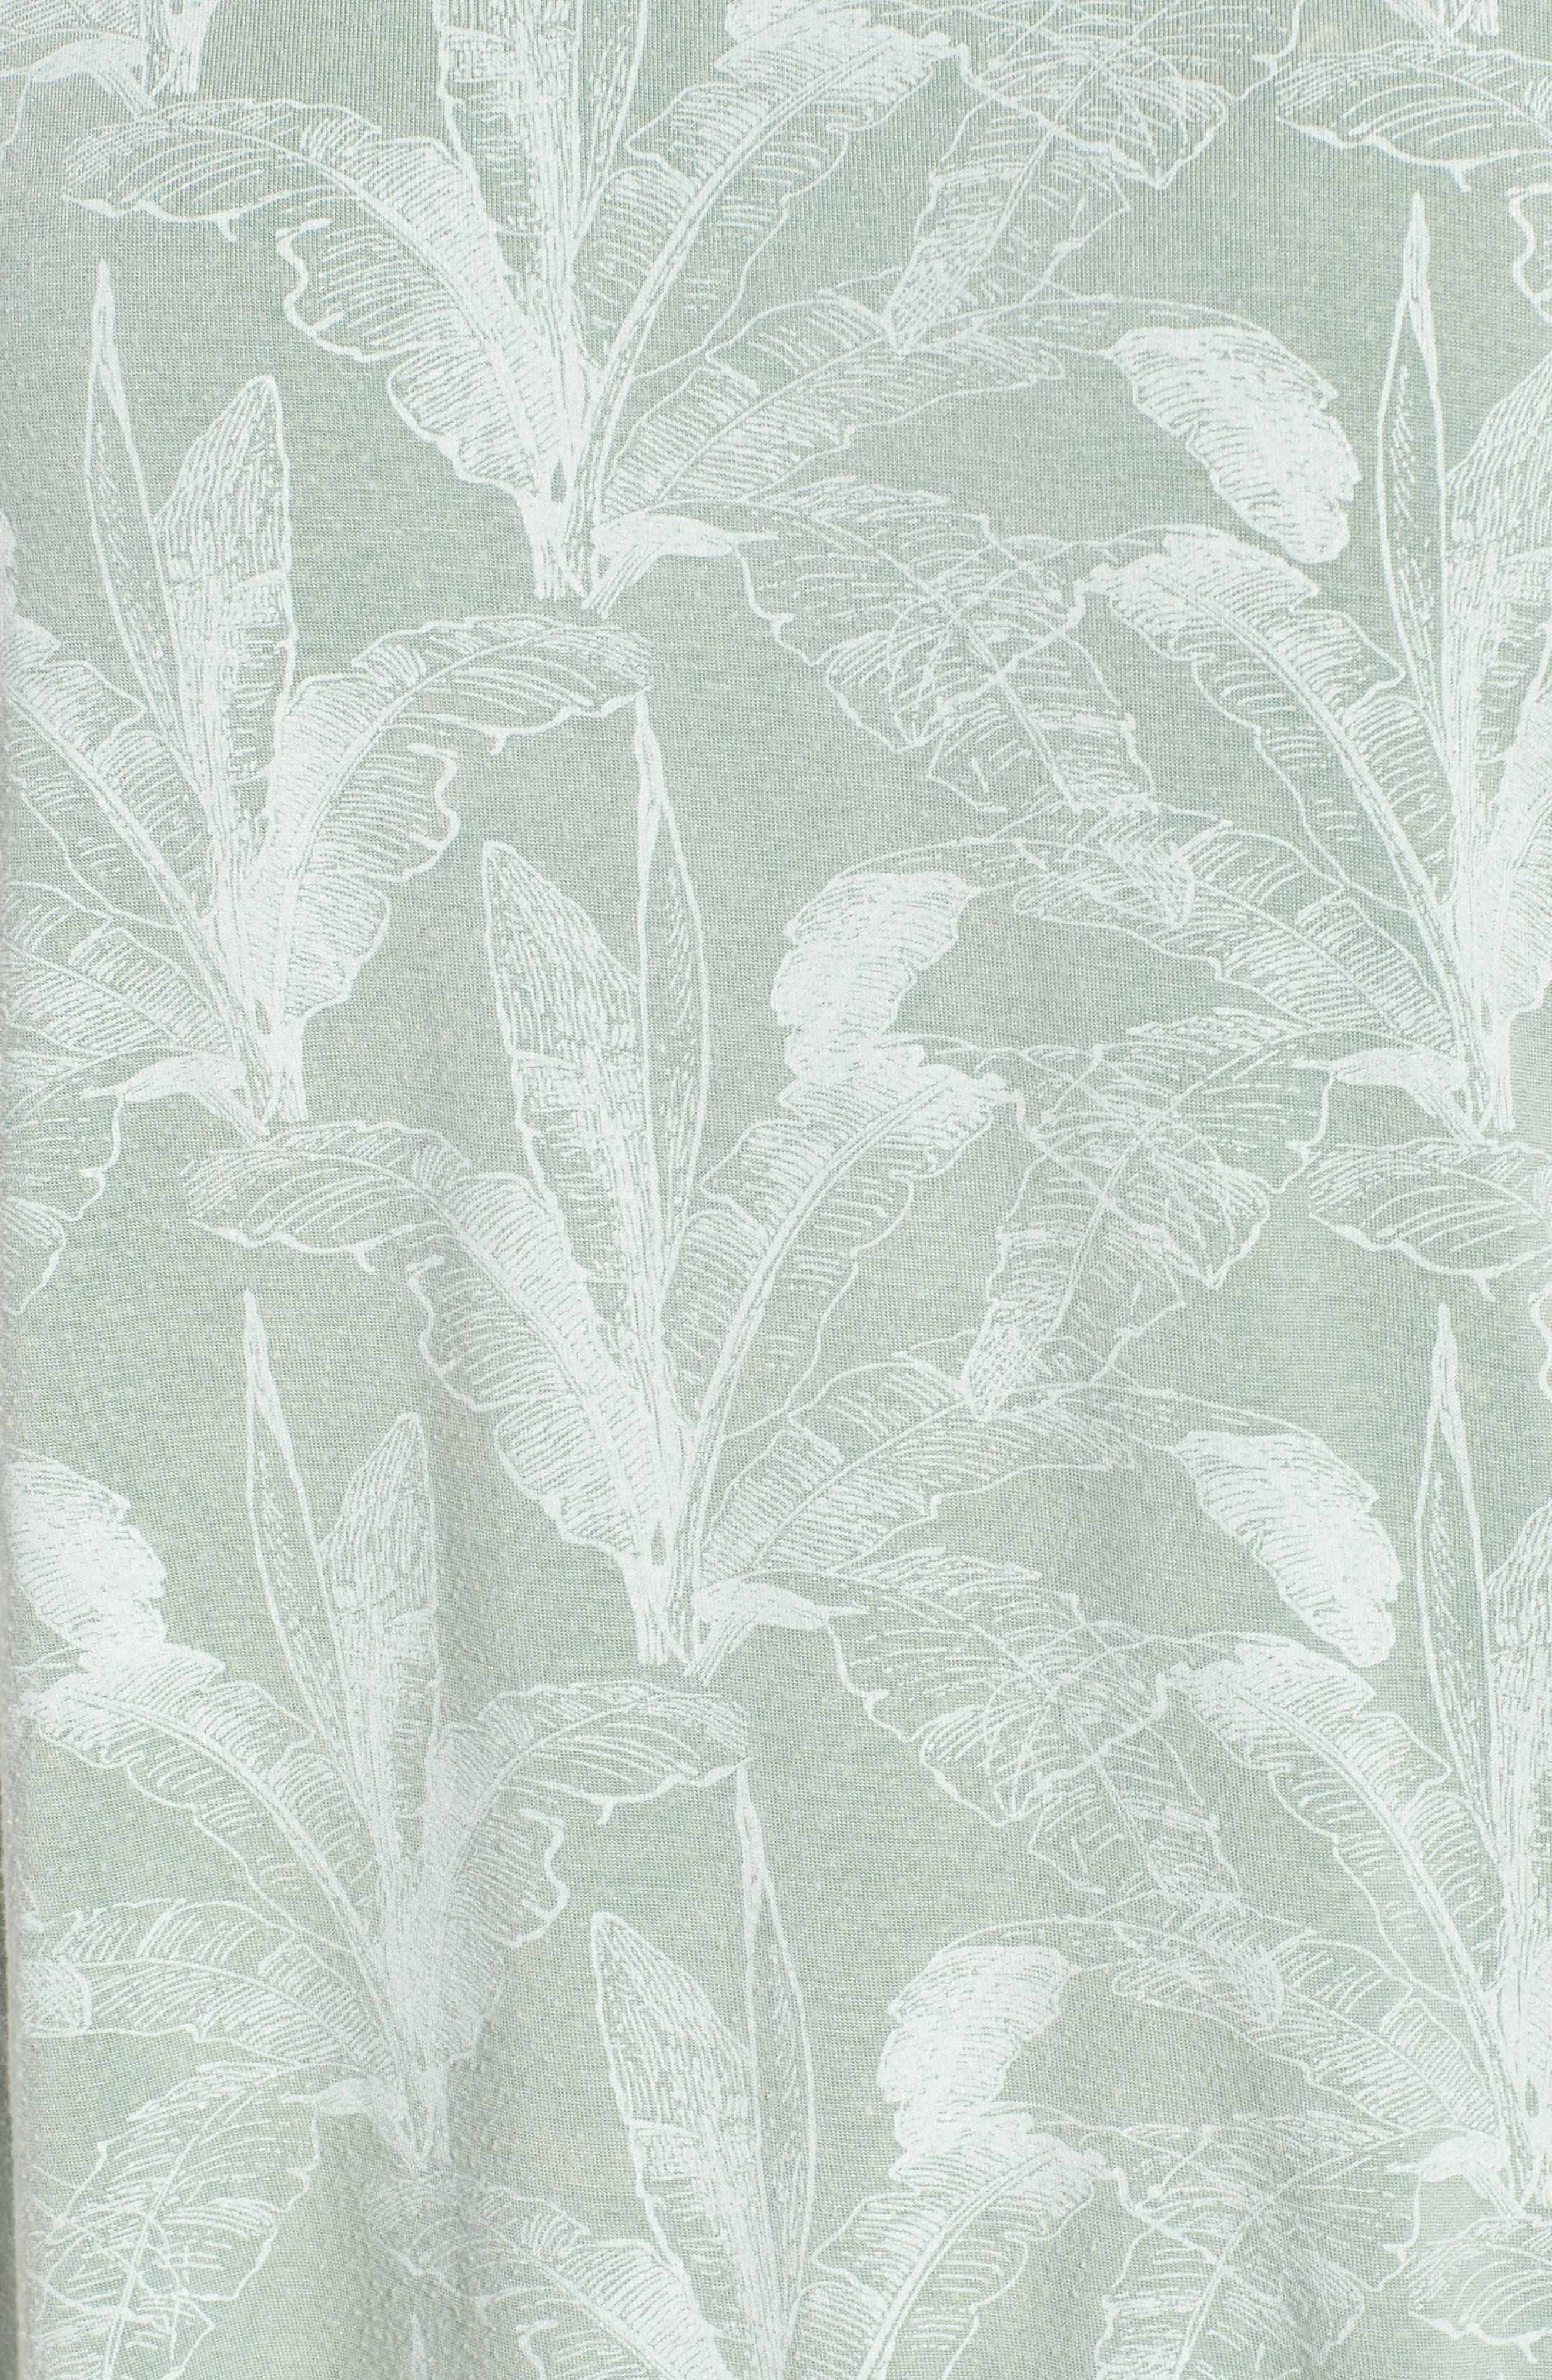 Suspension Print Stretch Modal Tee,                             Alternate thumbnail 6, color,                             Granite